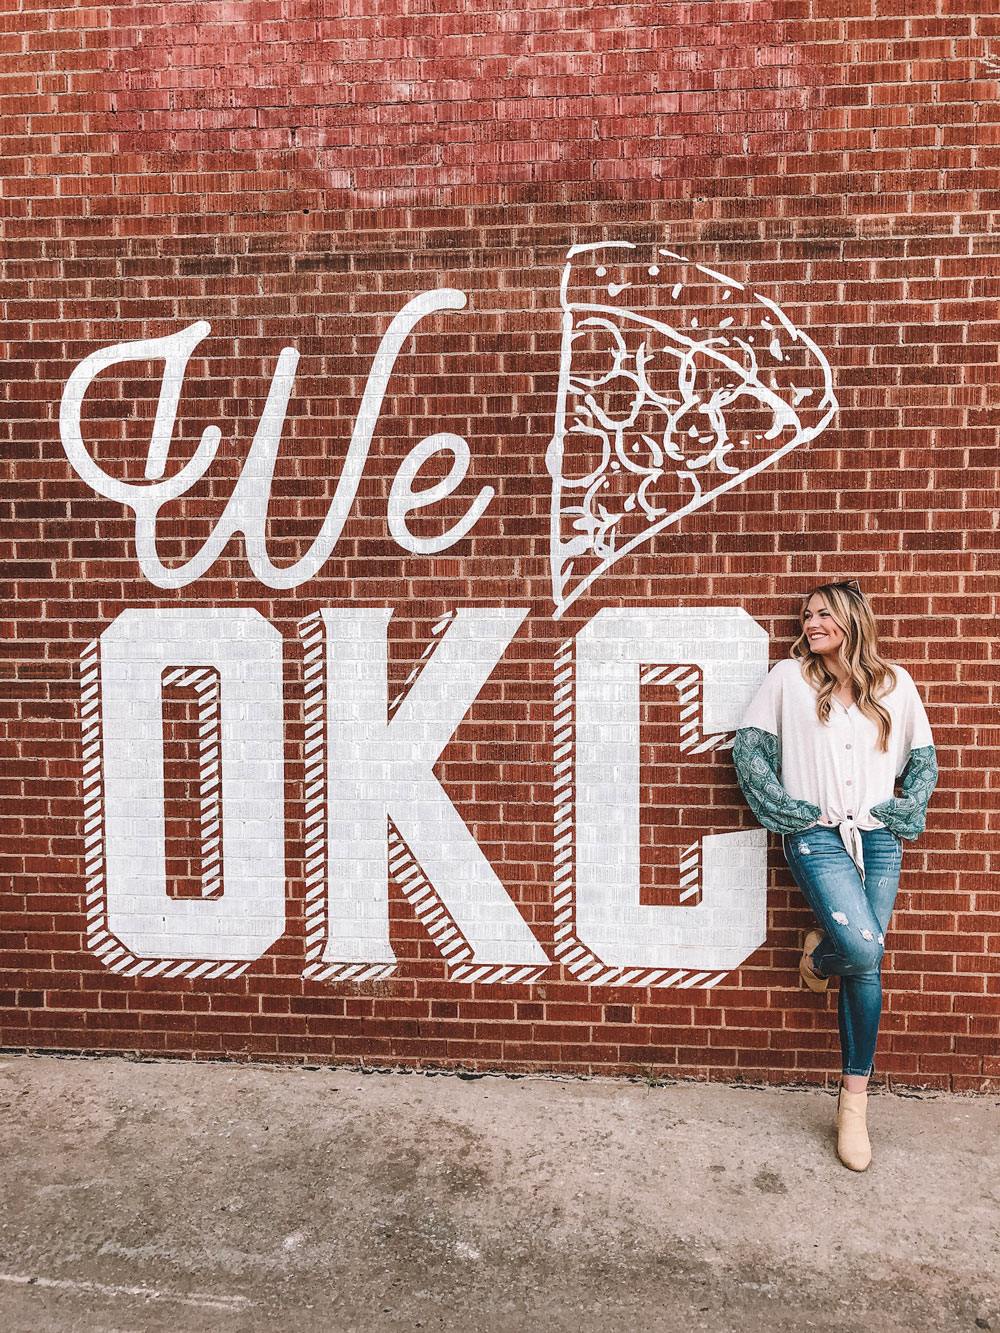 Where to eat in Midtown, Oklahoma City, according to Amanda Martin of Amanda's OK Blog